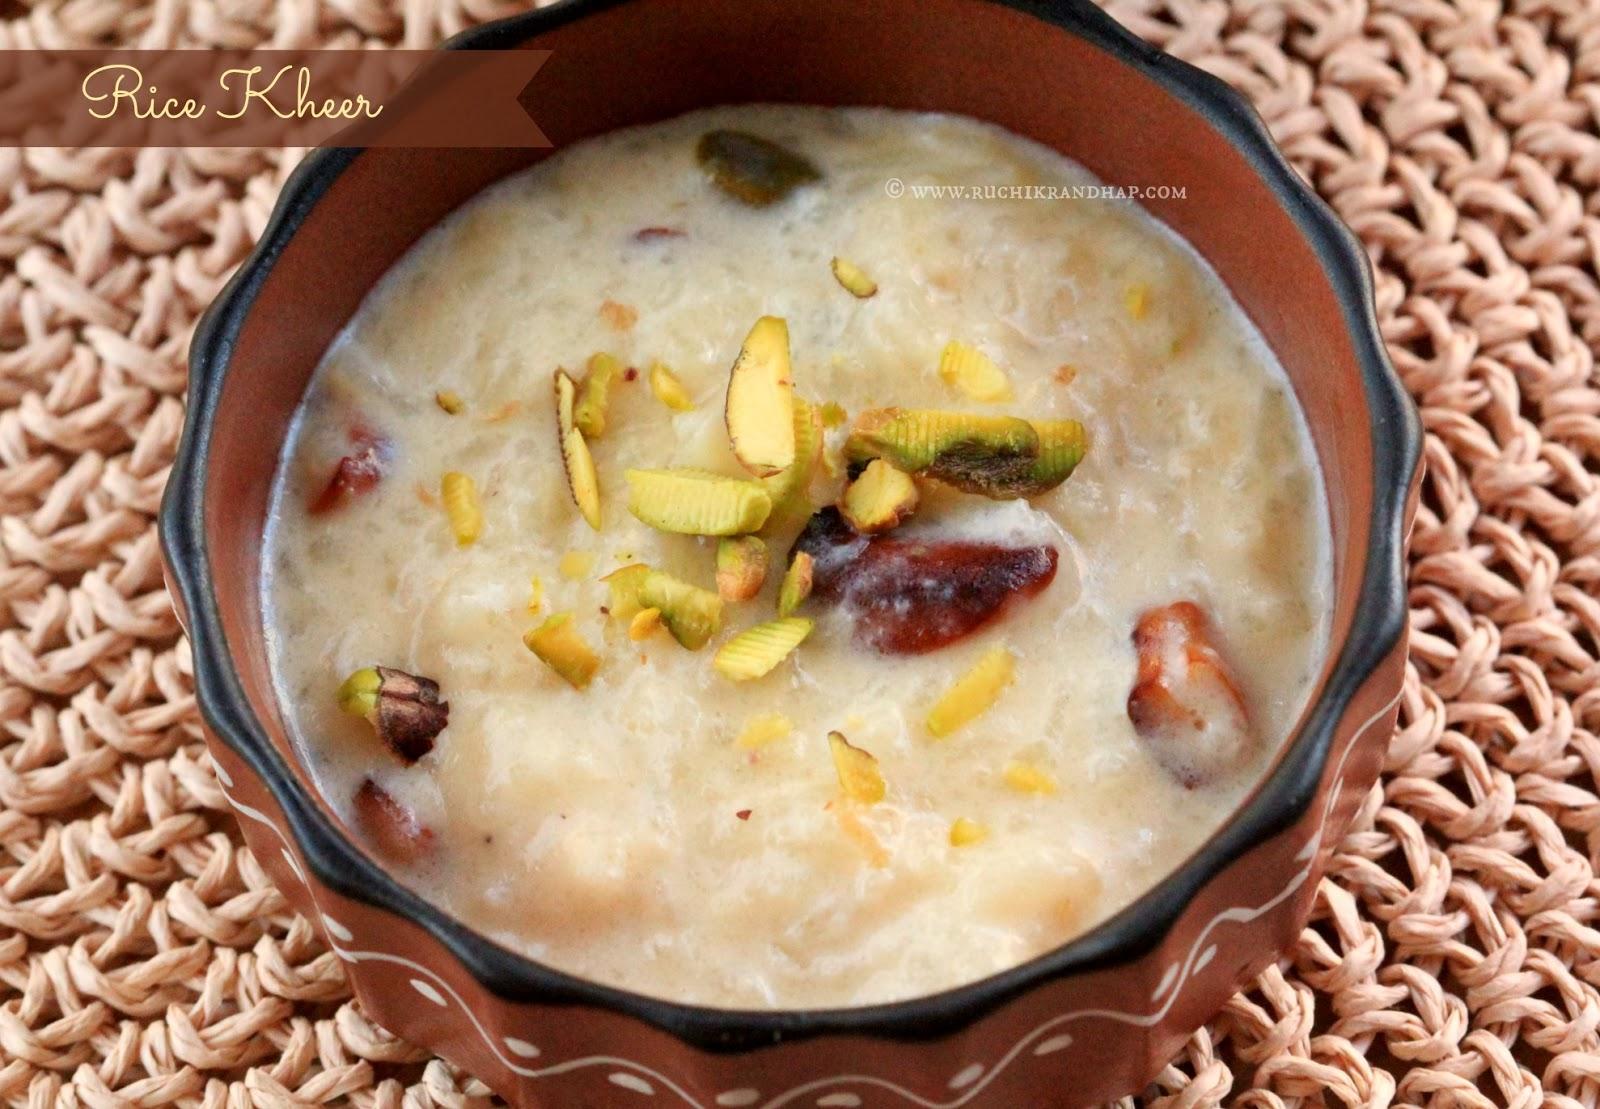 Rice kheer rice pudding ruchik randhap rice kheer rice pudding ccuart Gallery